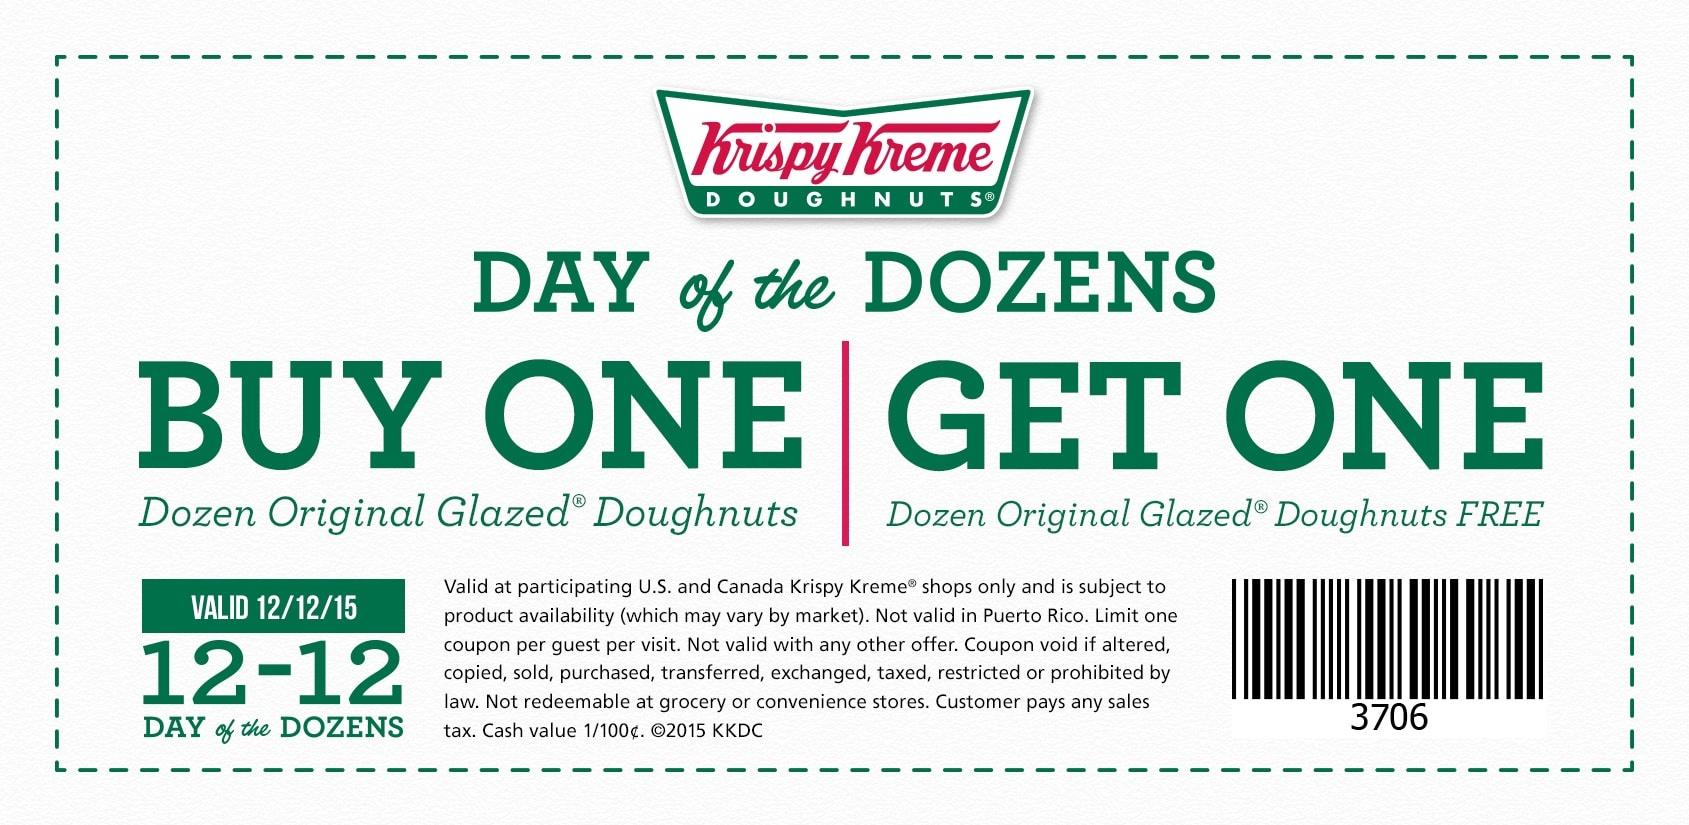 Krispy Kreme - Printable Coupons And Deals - Free Printable Krispy Kreme Coupons